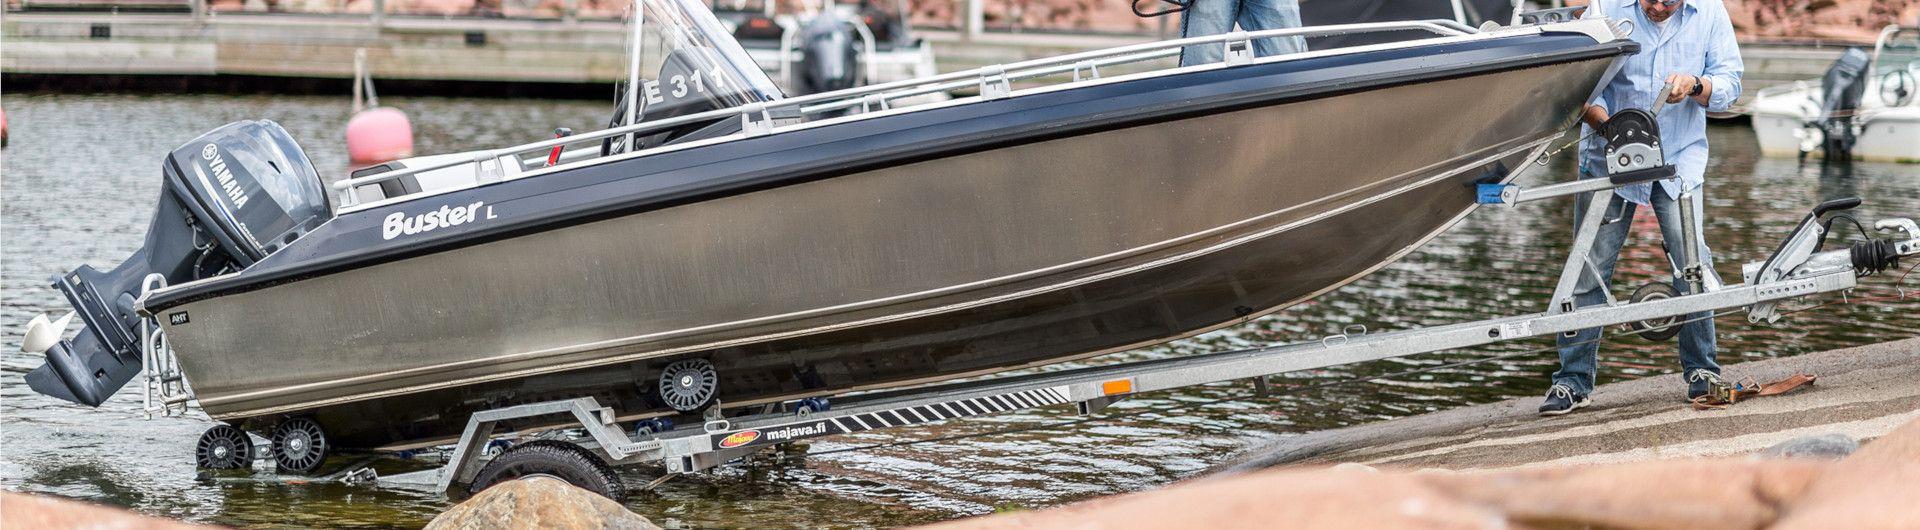 Sportboot Aluminiumboot Buster L1 Header